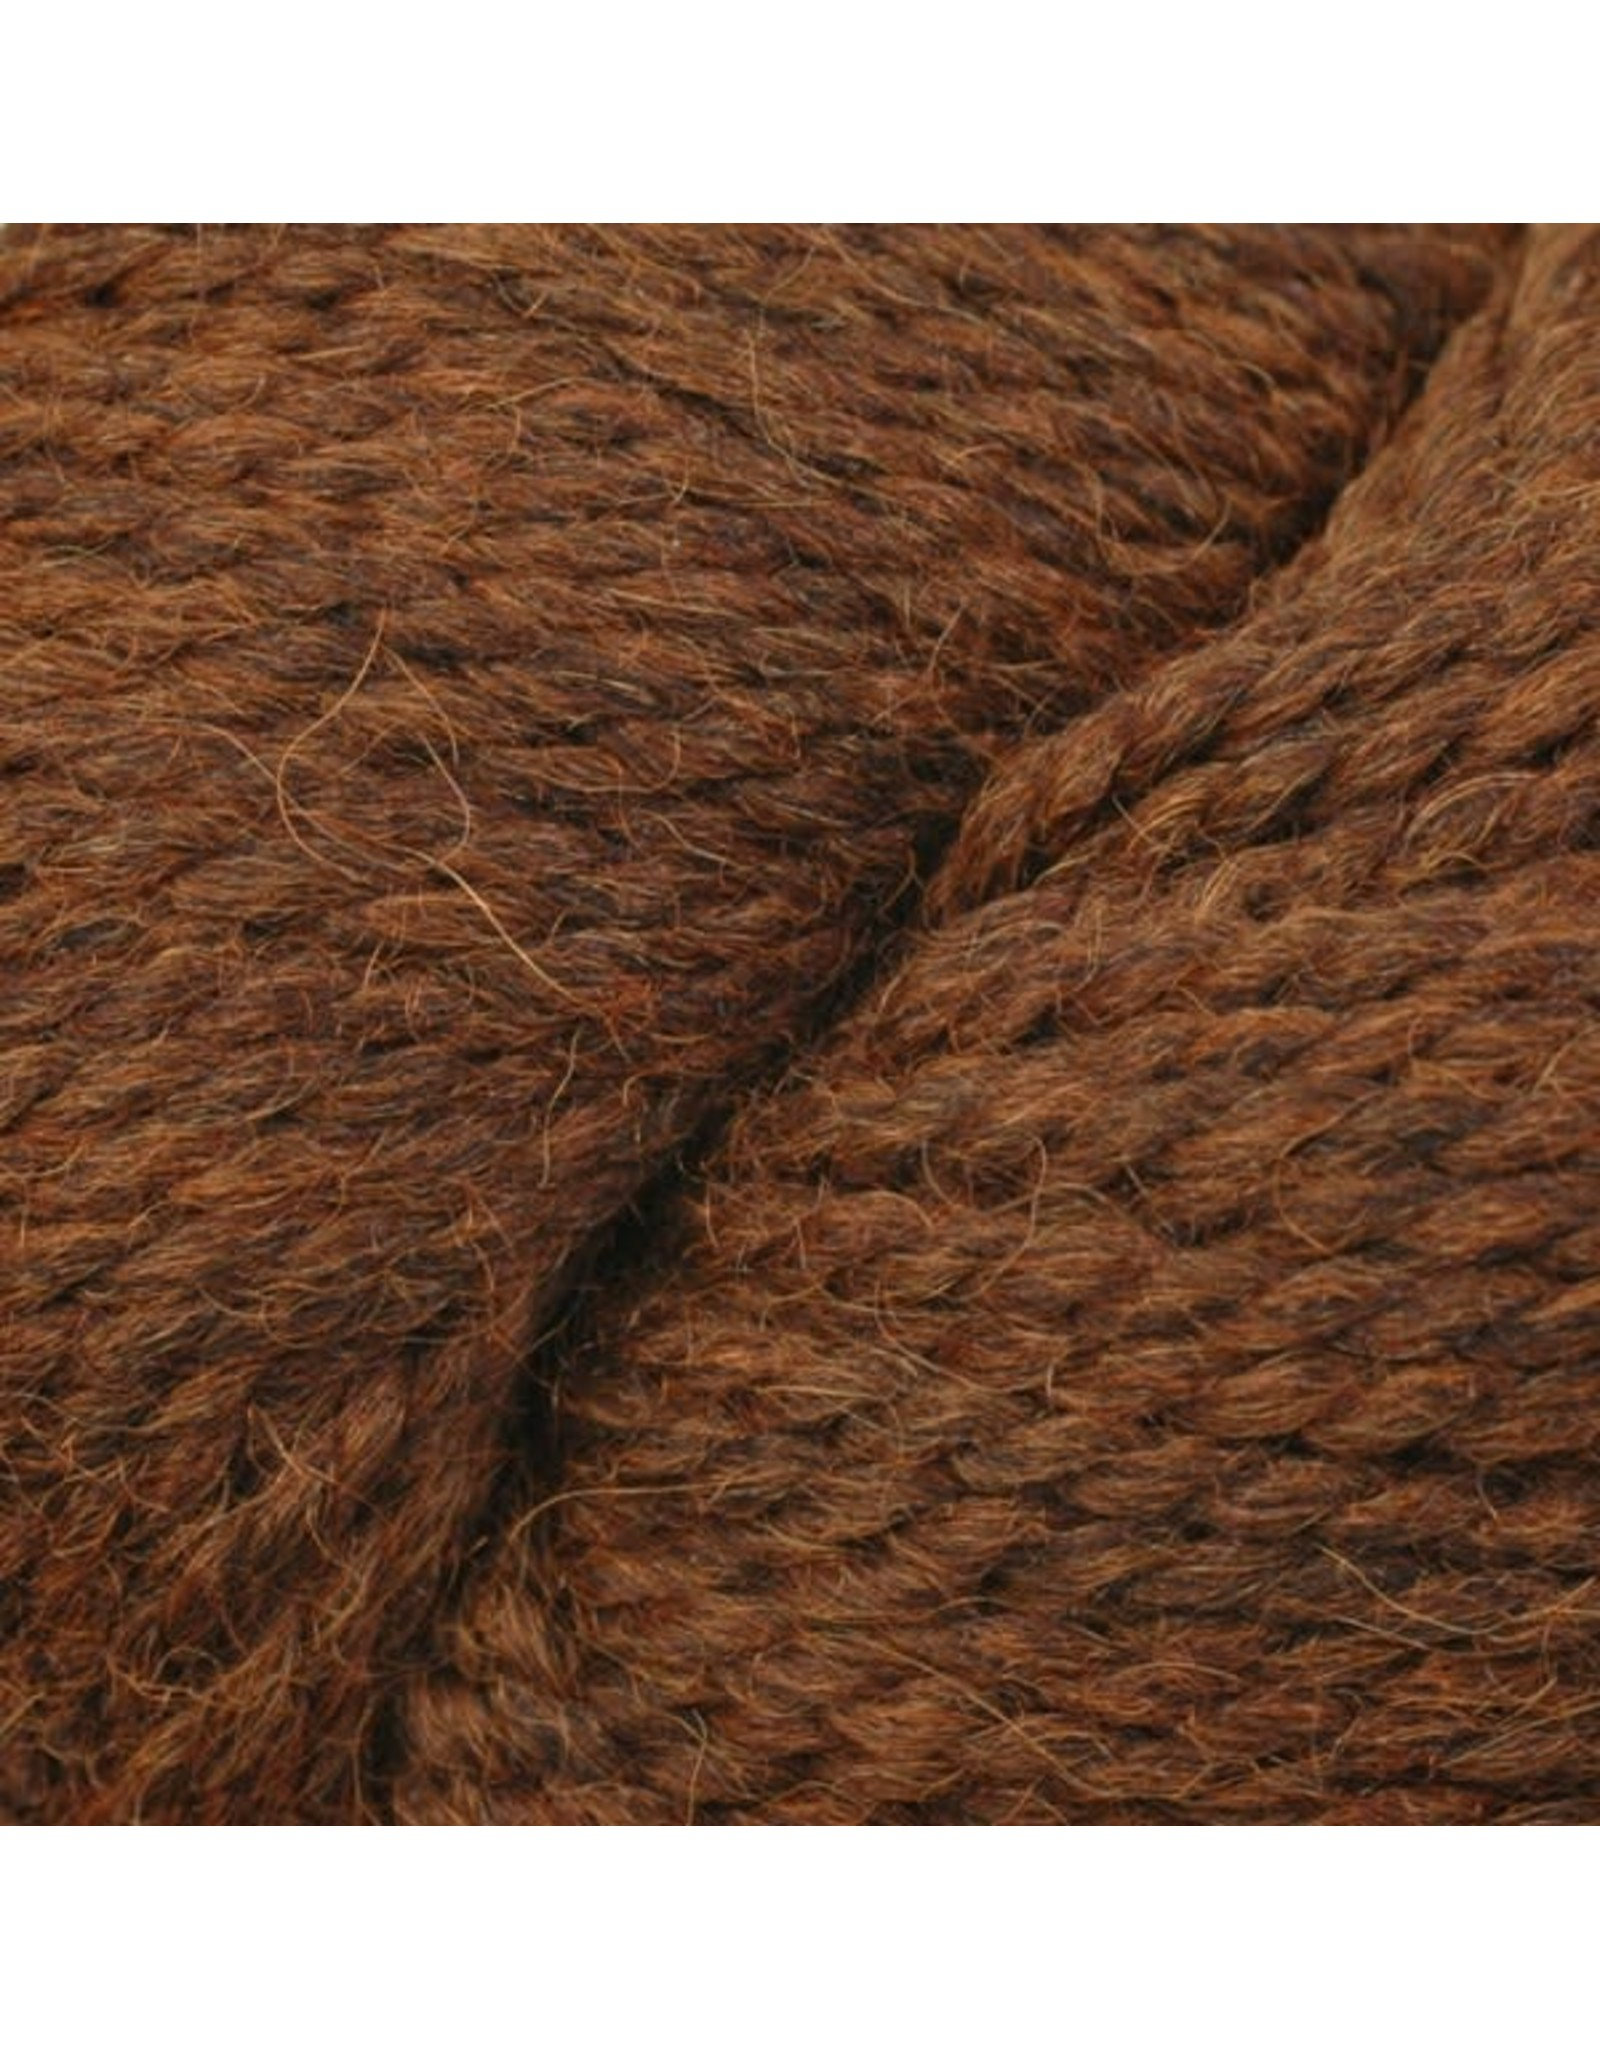 7279 Potting Soil Mix - Ultra Alpaca Chunky - Berroco